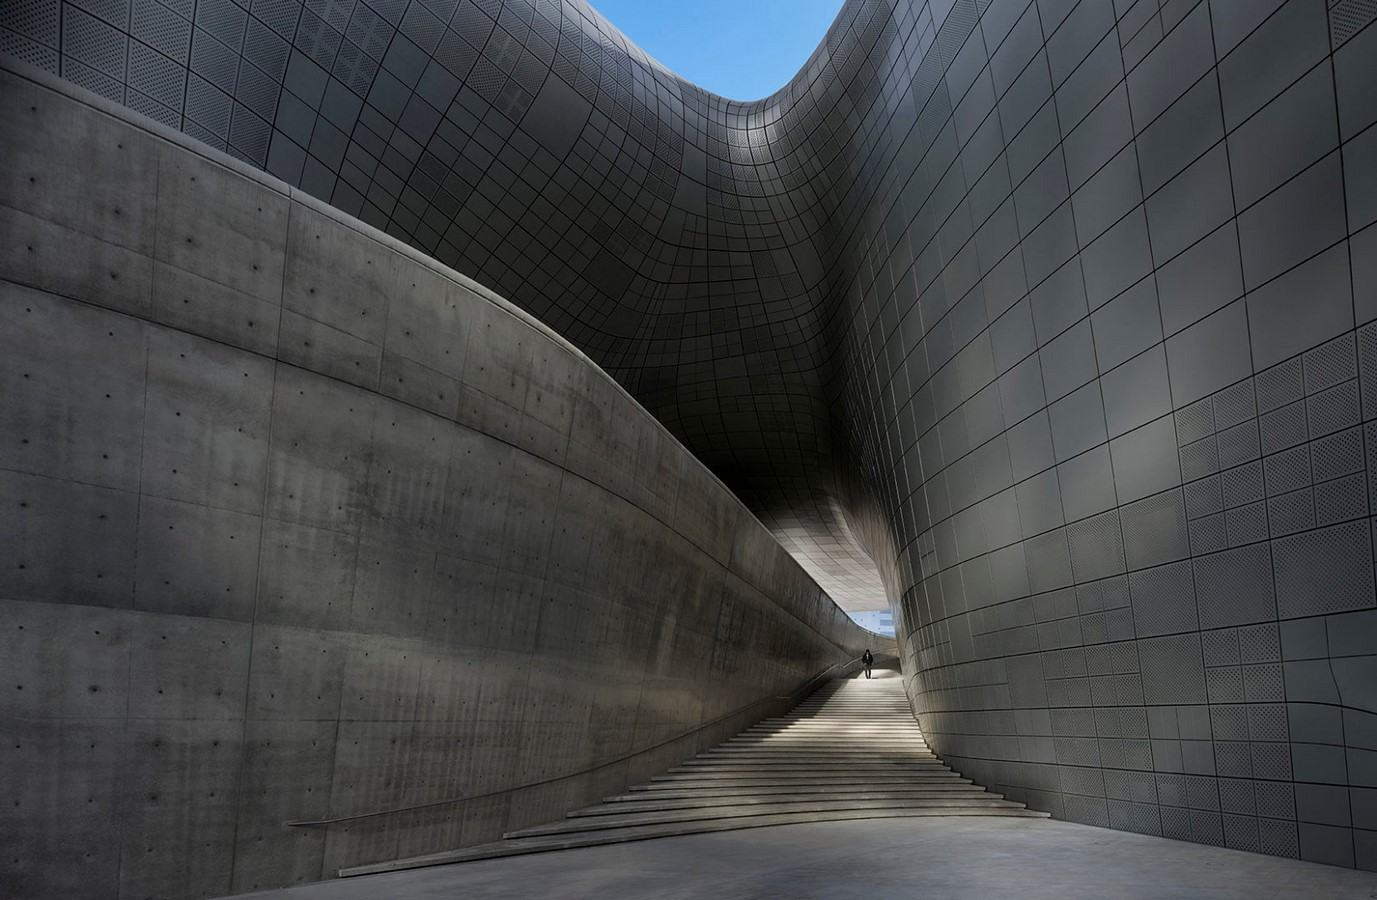 Dongdaemun Design Plaza, Seoul by Zaha Hadid: The Metonymic Landscape - Sheet4